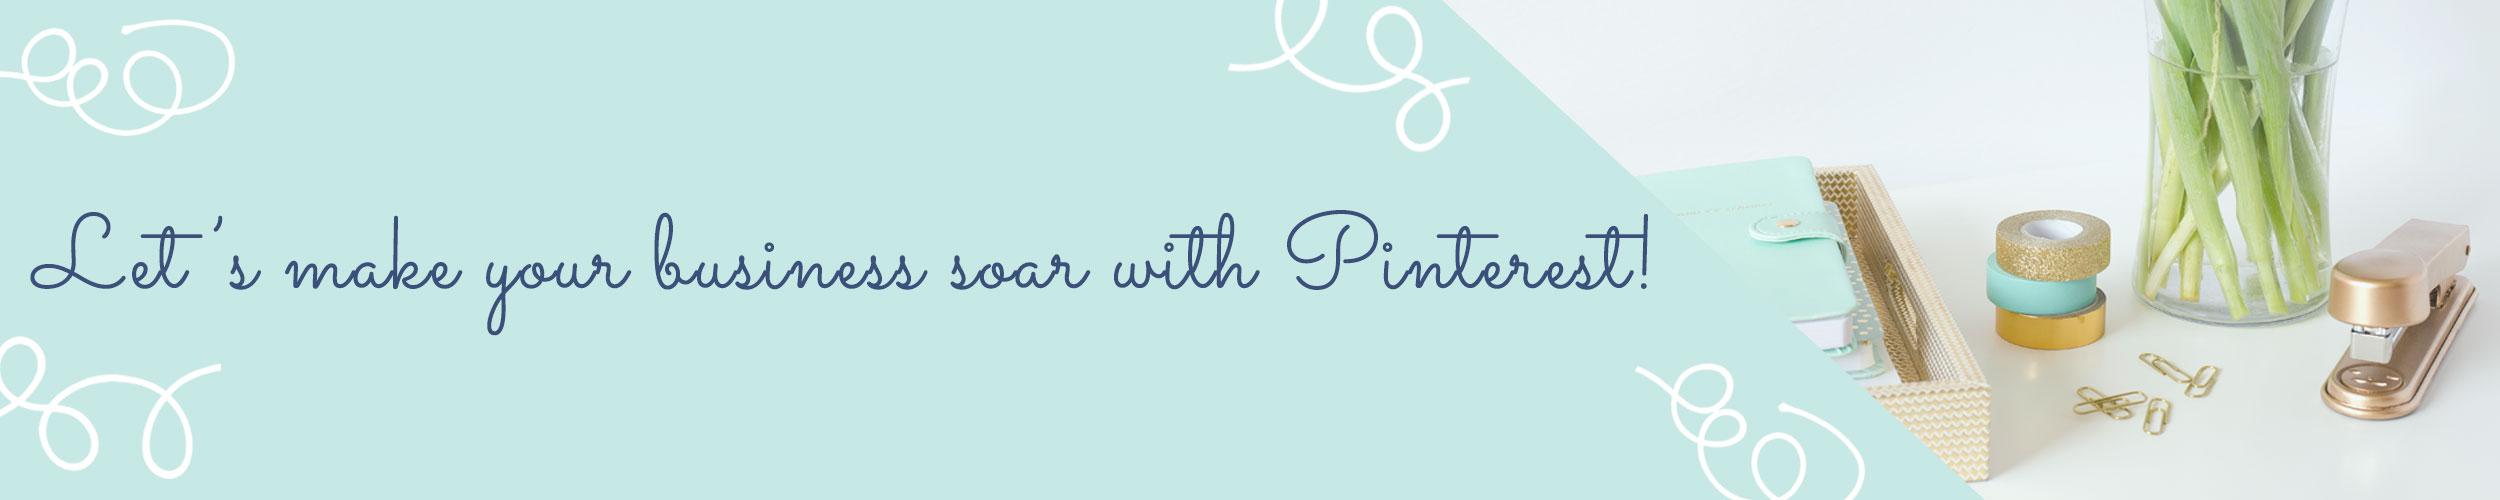 Pinterest Management Services for content creators - Untangled